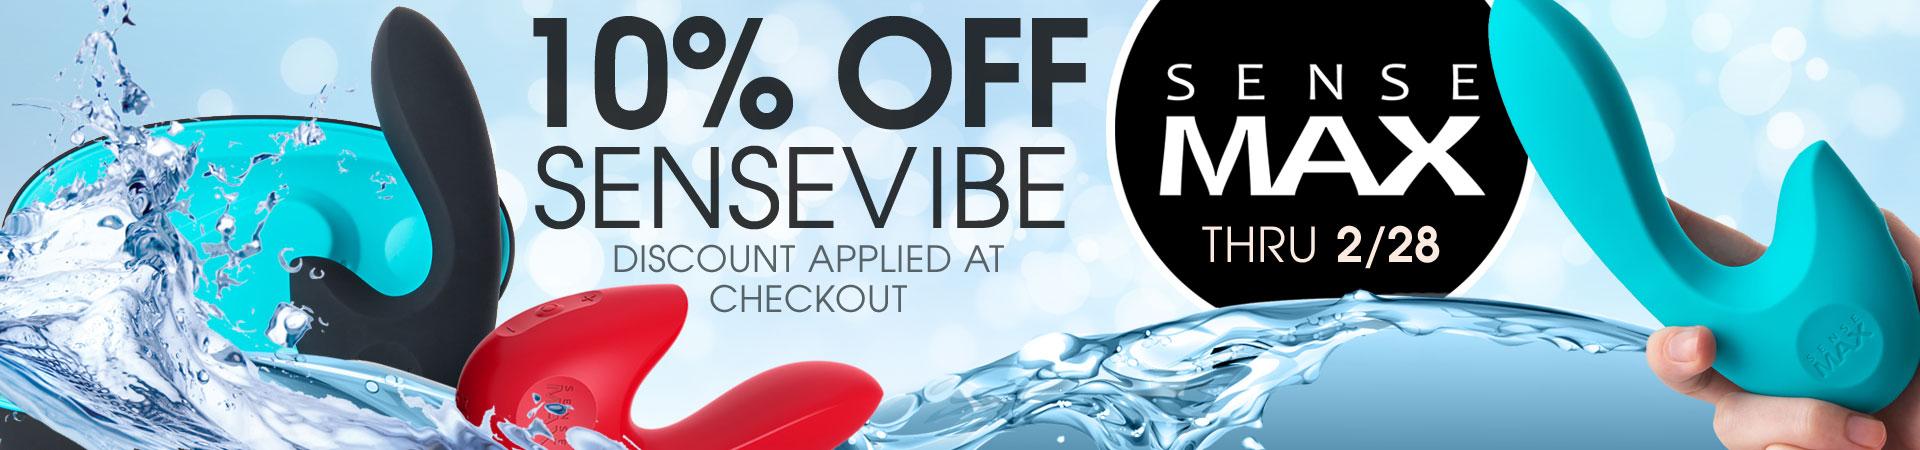 10% Off SenseMax - Now Thru 2/28 - Discount Applied At Checkout